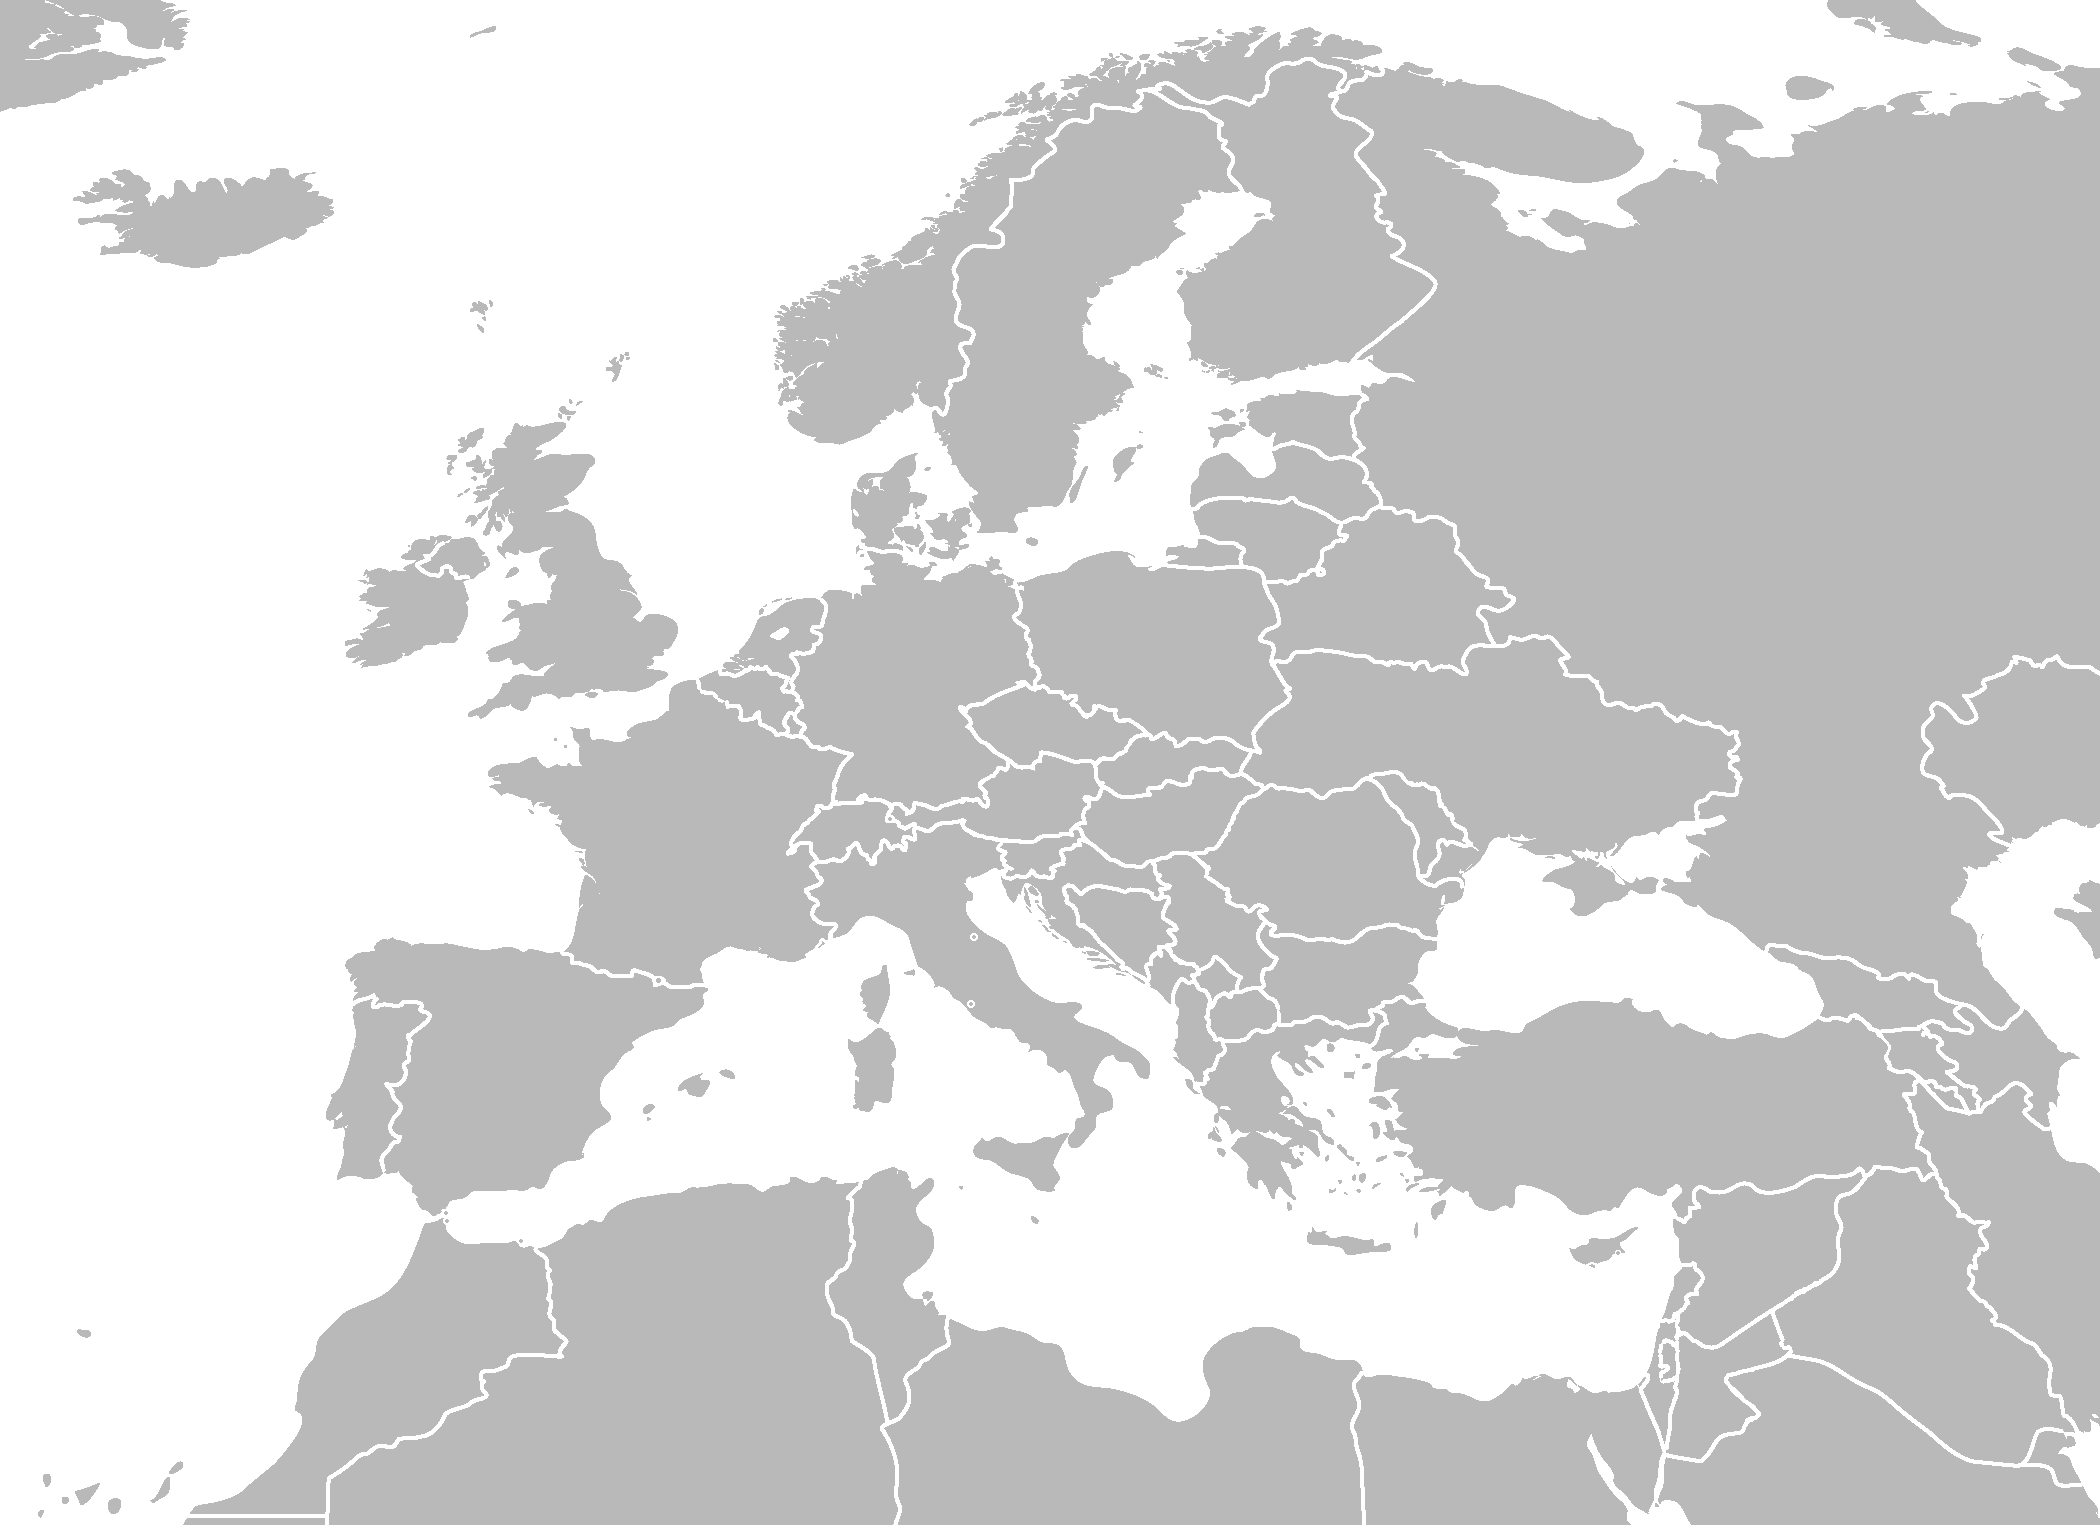 Fileblankmap Europe V4 Png Wikimedia Commons